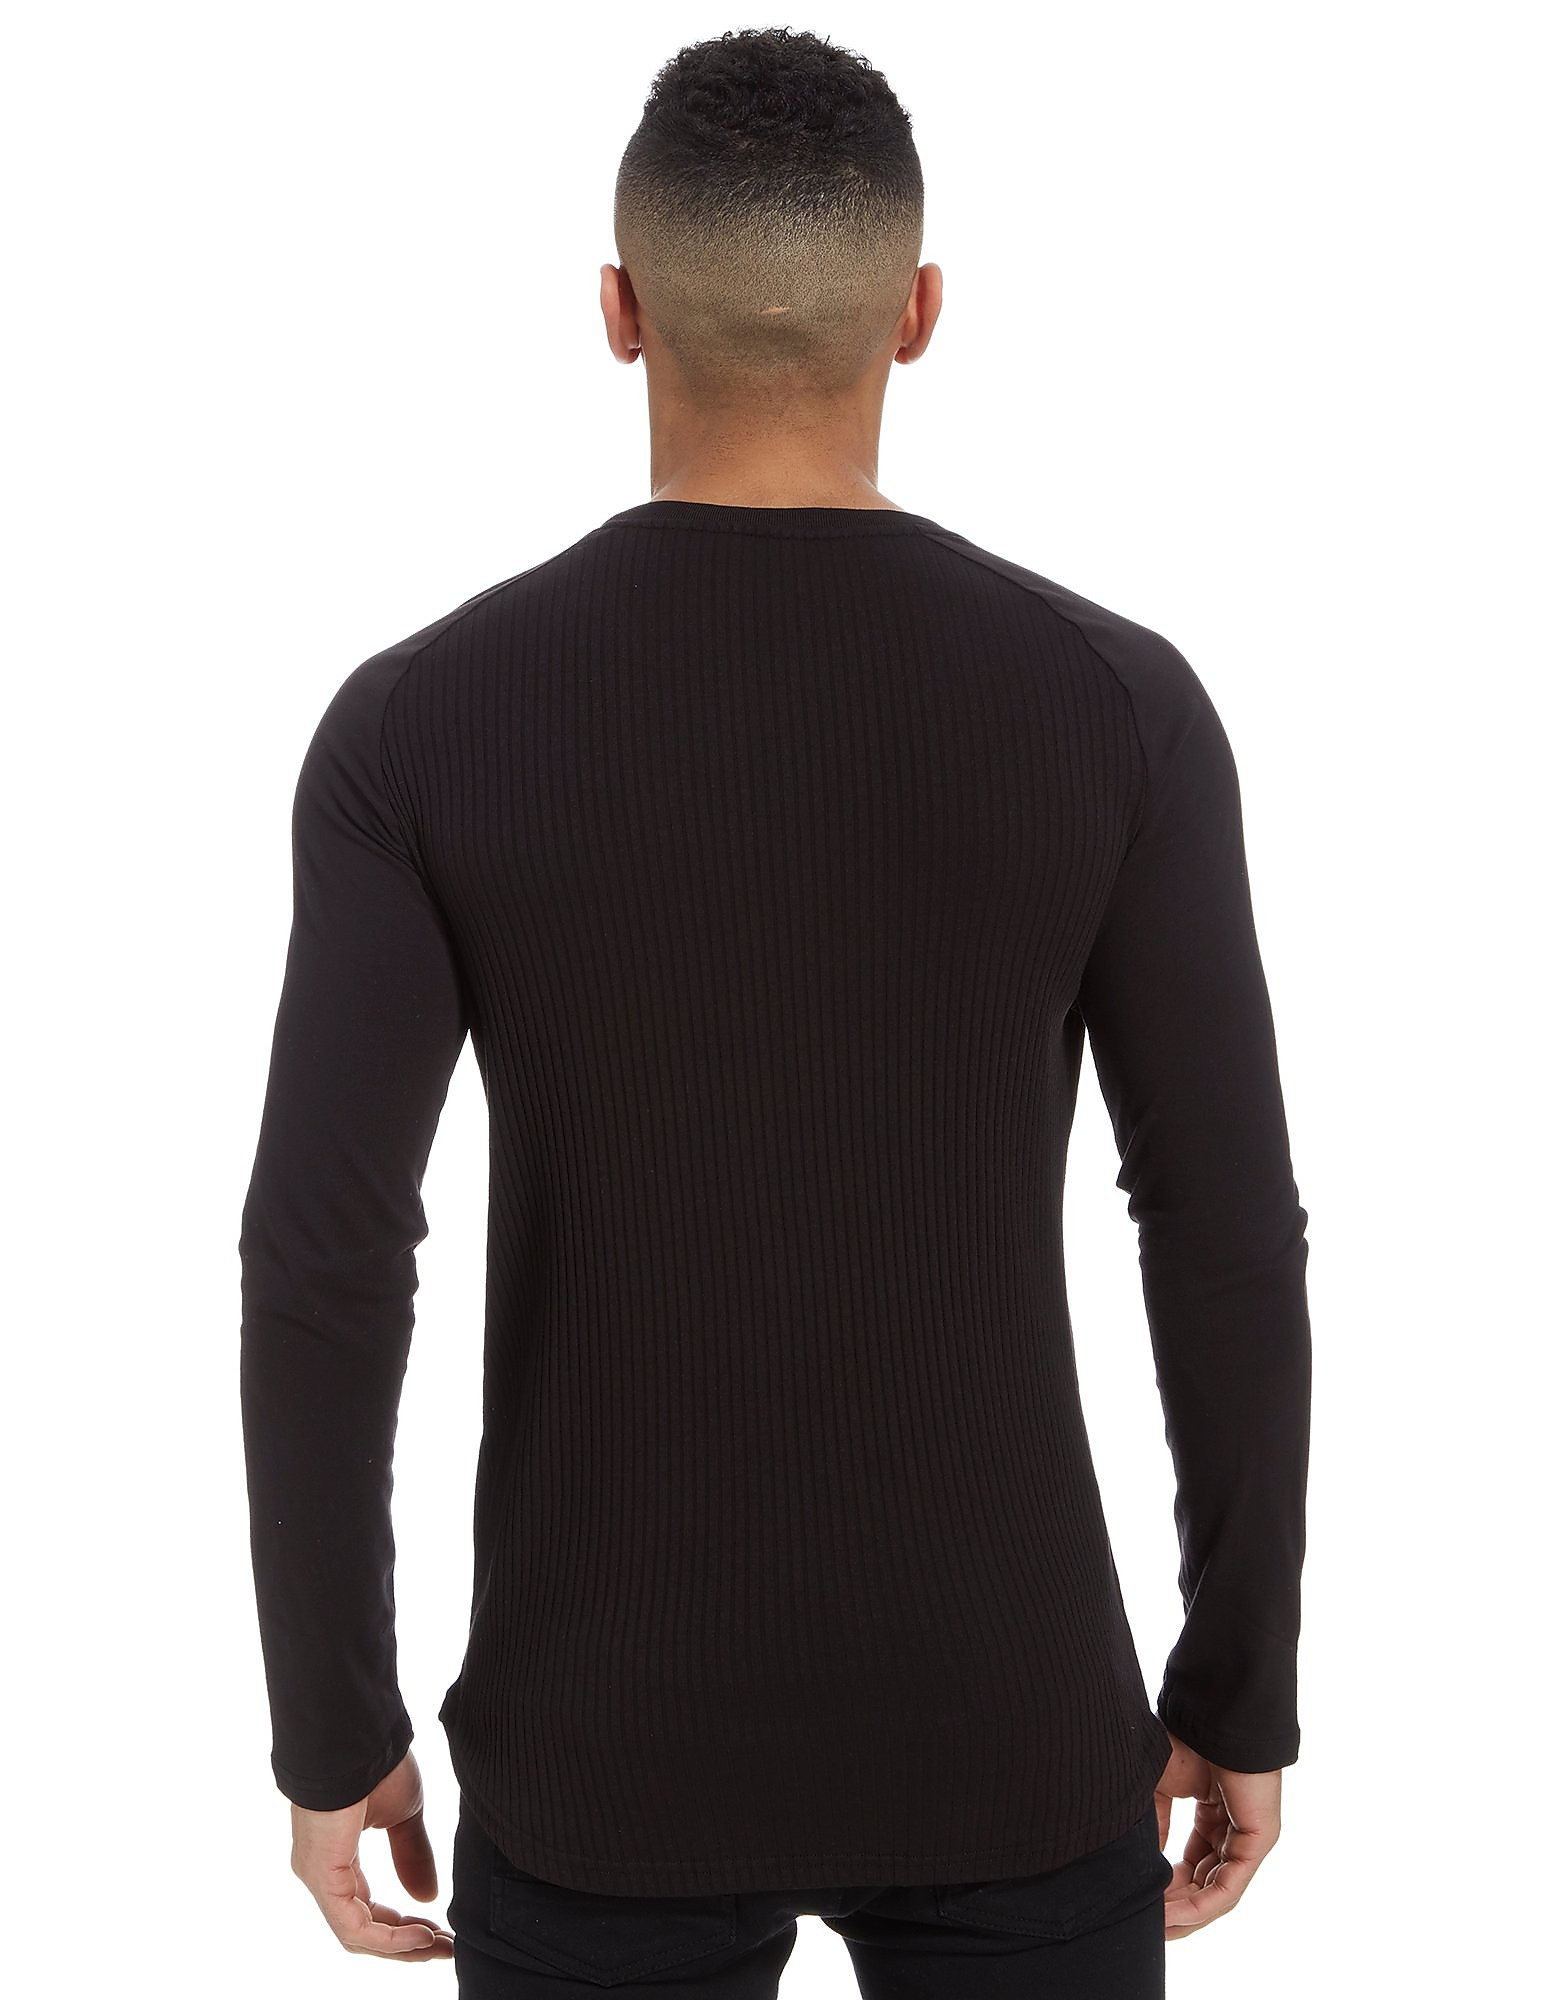 Sonneti Ribbed Raglan Long Sleeve T-Shirt